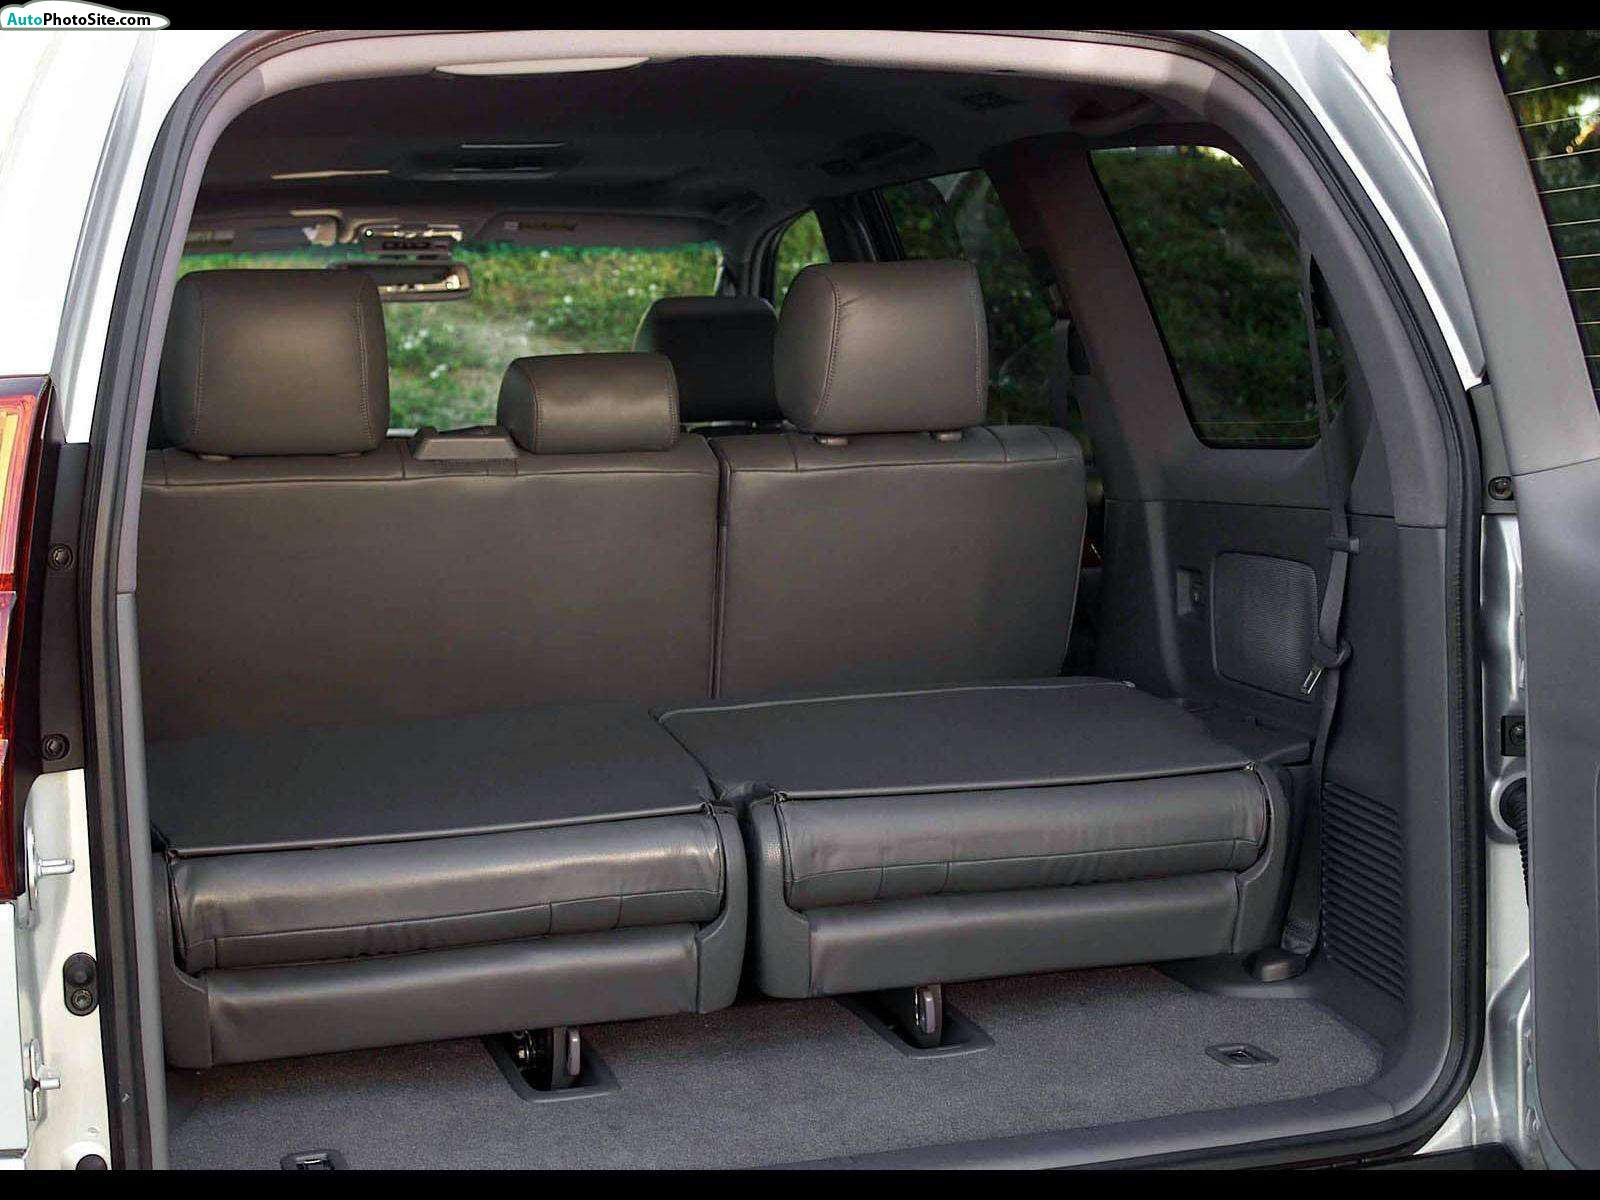 Lexus Gx 460 Reviews >> 2003 LEXUS GX 470 - Image #6